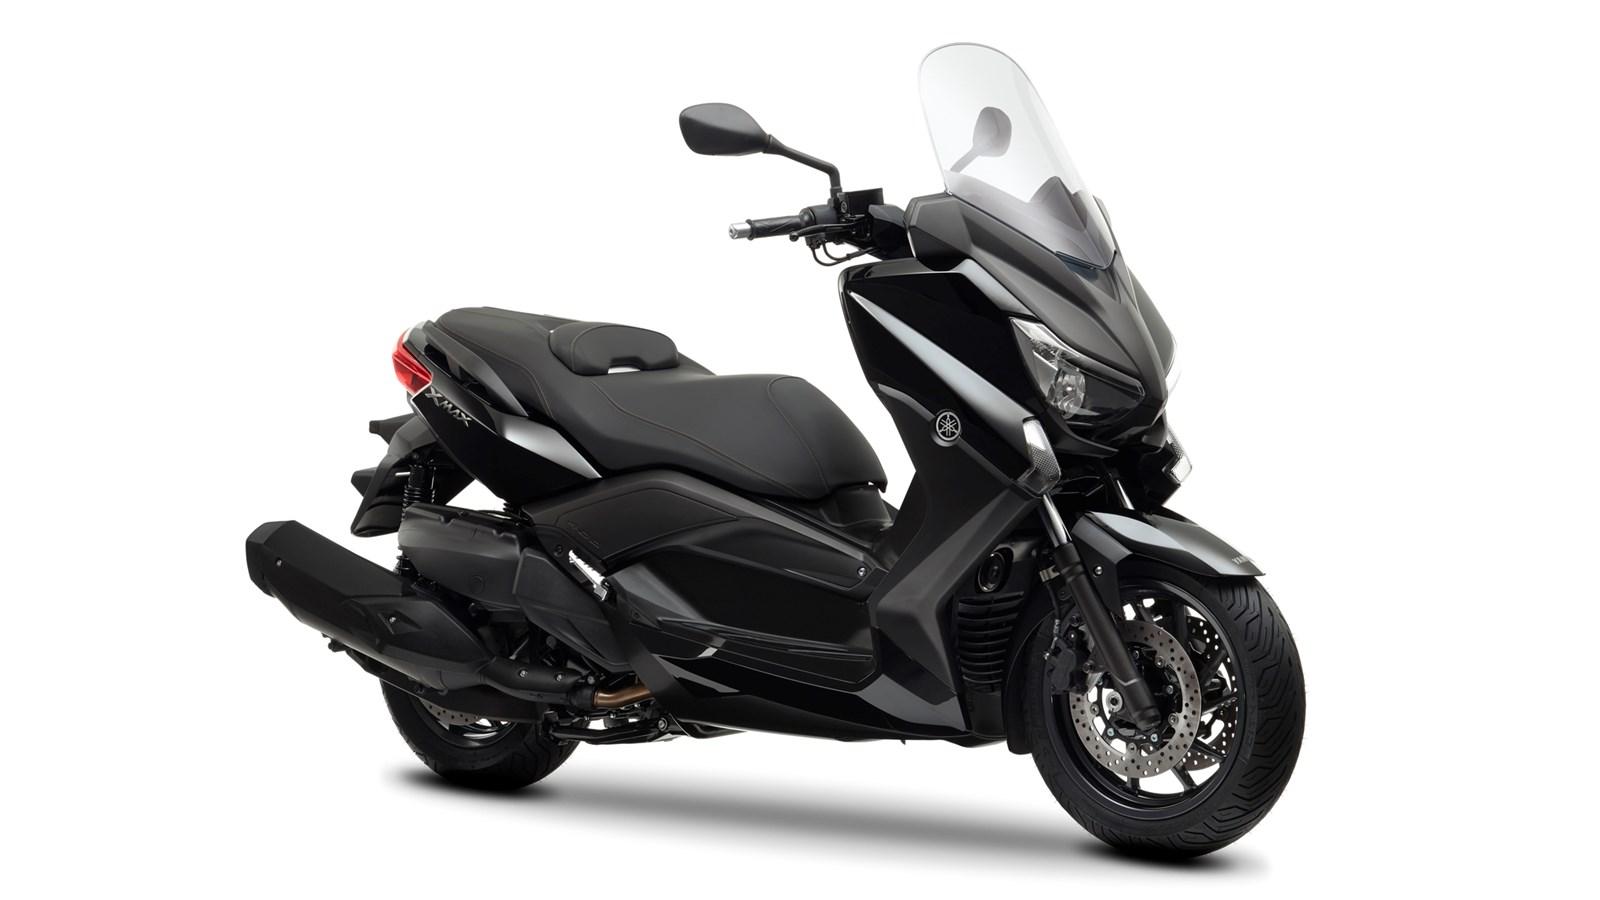 http://cdn.yamaha-motor.eu/product_assets/2013/XMAX400/2013-Yamaha-X-MAX-400-EU-Midnight-Black-Studio-001.jpg?width=1600&quality=75